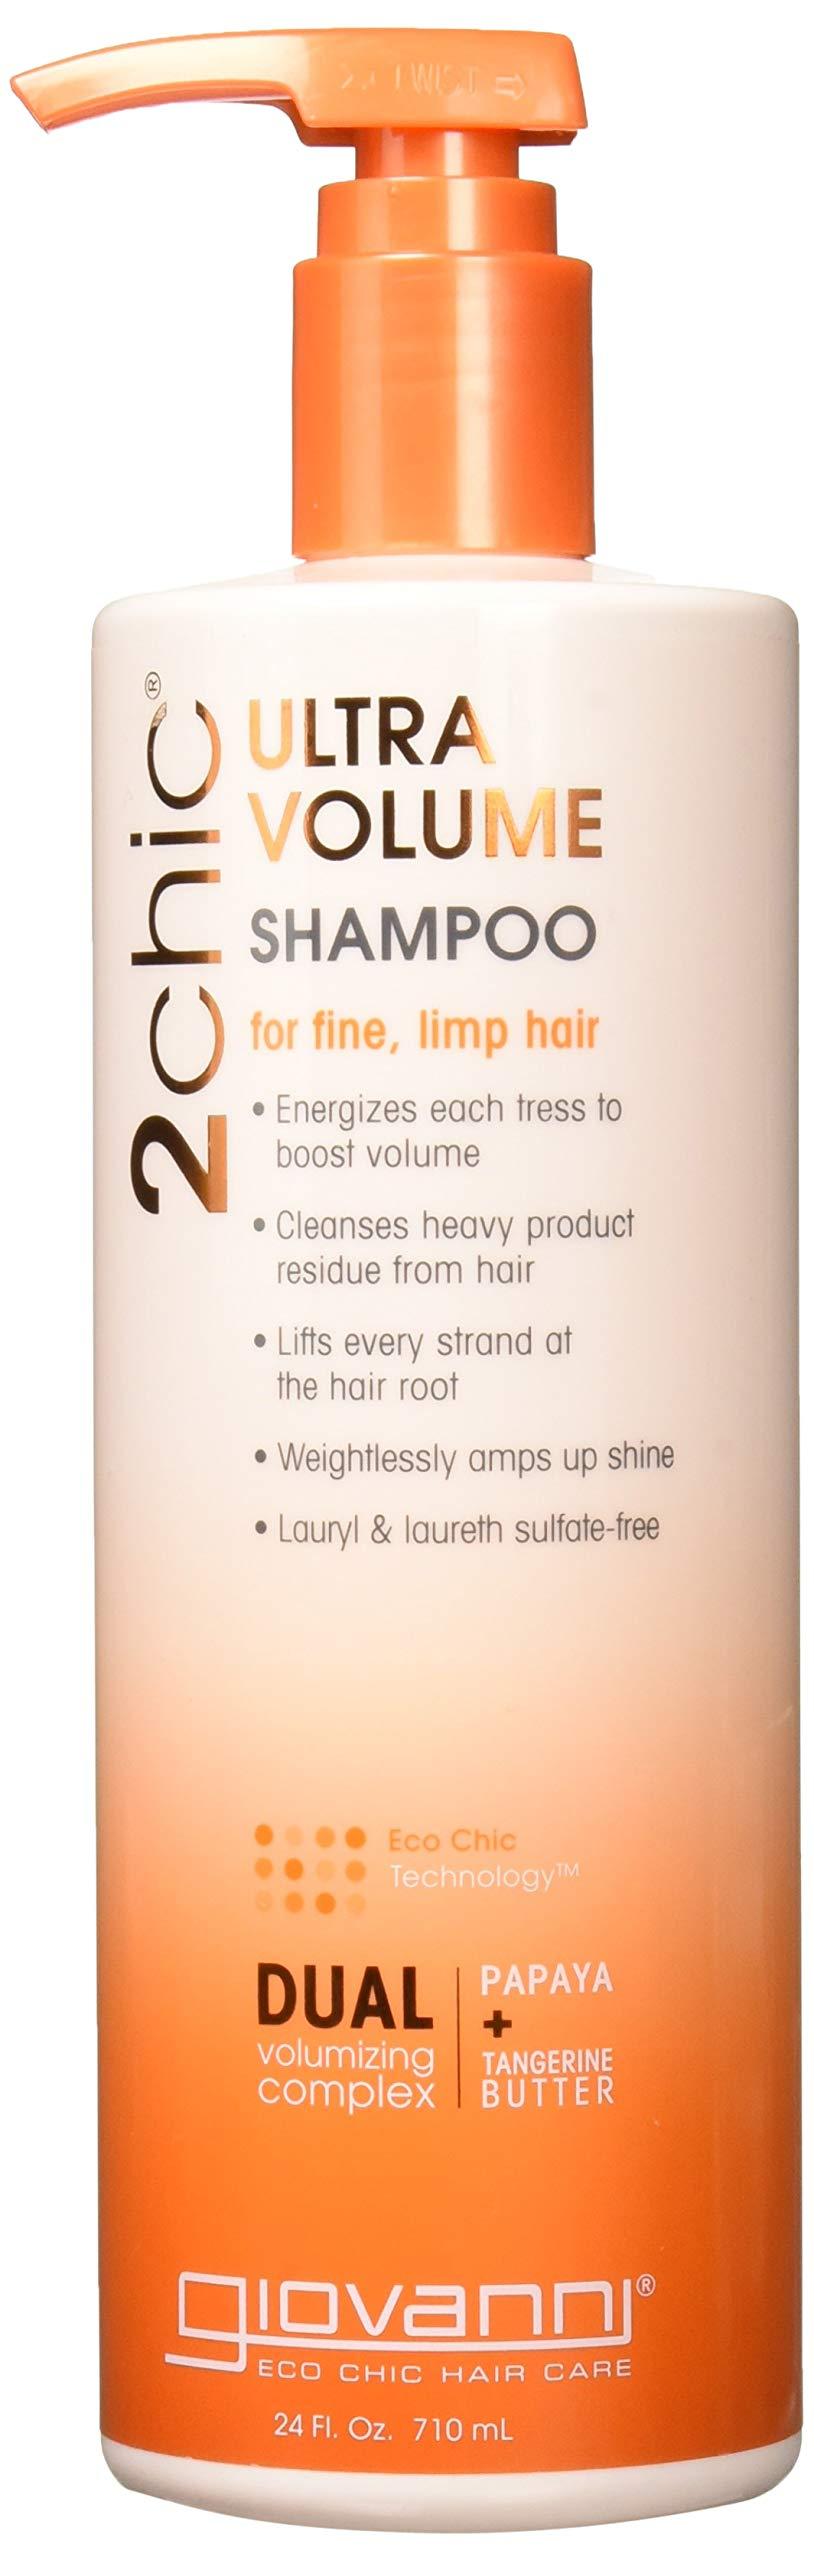 GIOVANNI Ultra Shampoo Tangerine Butter